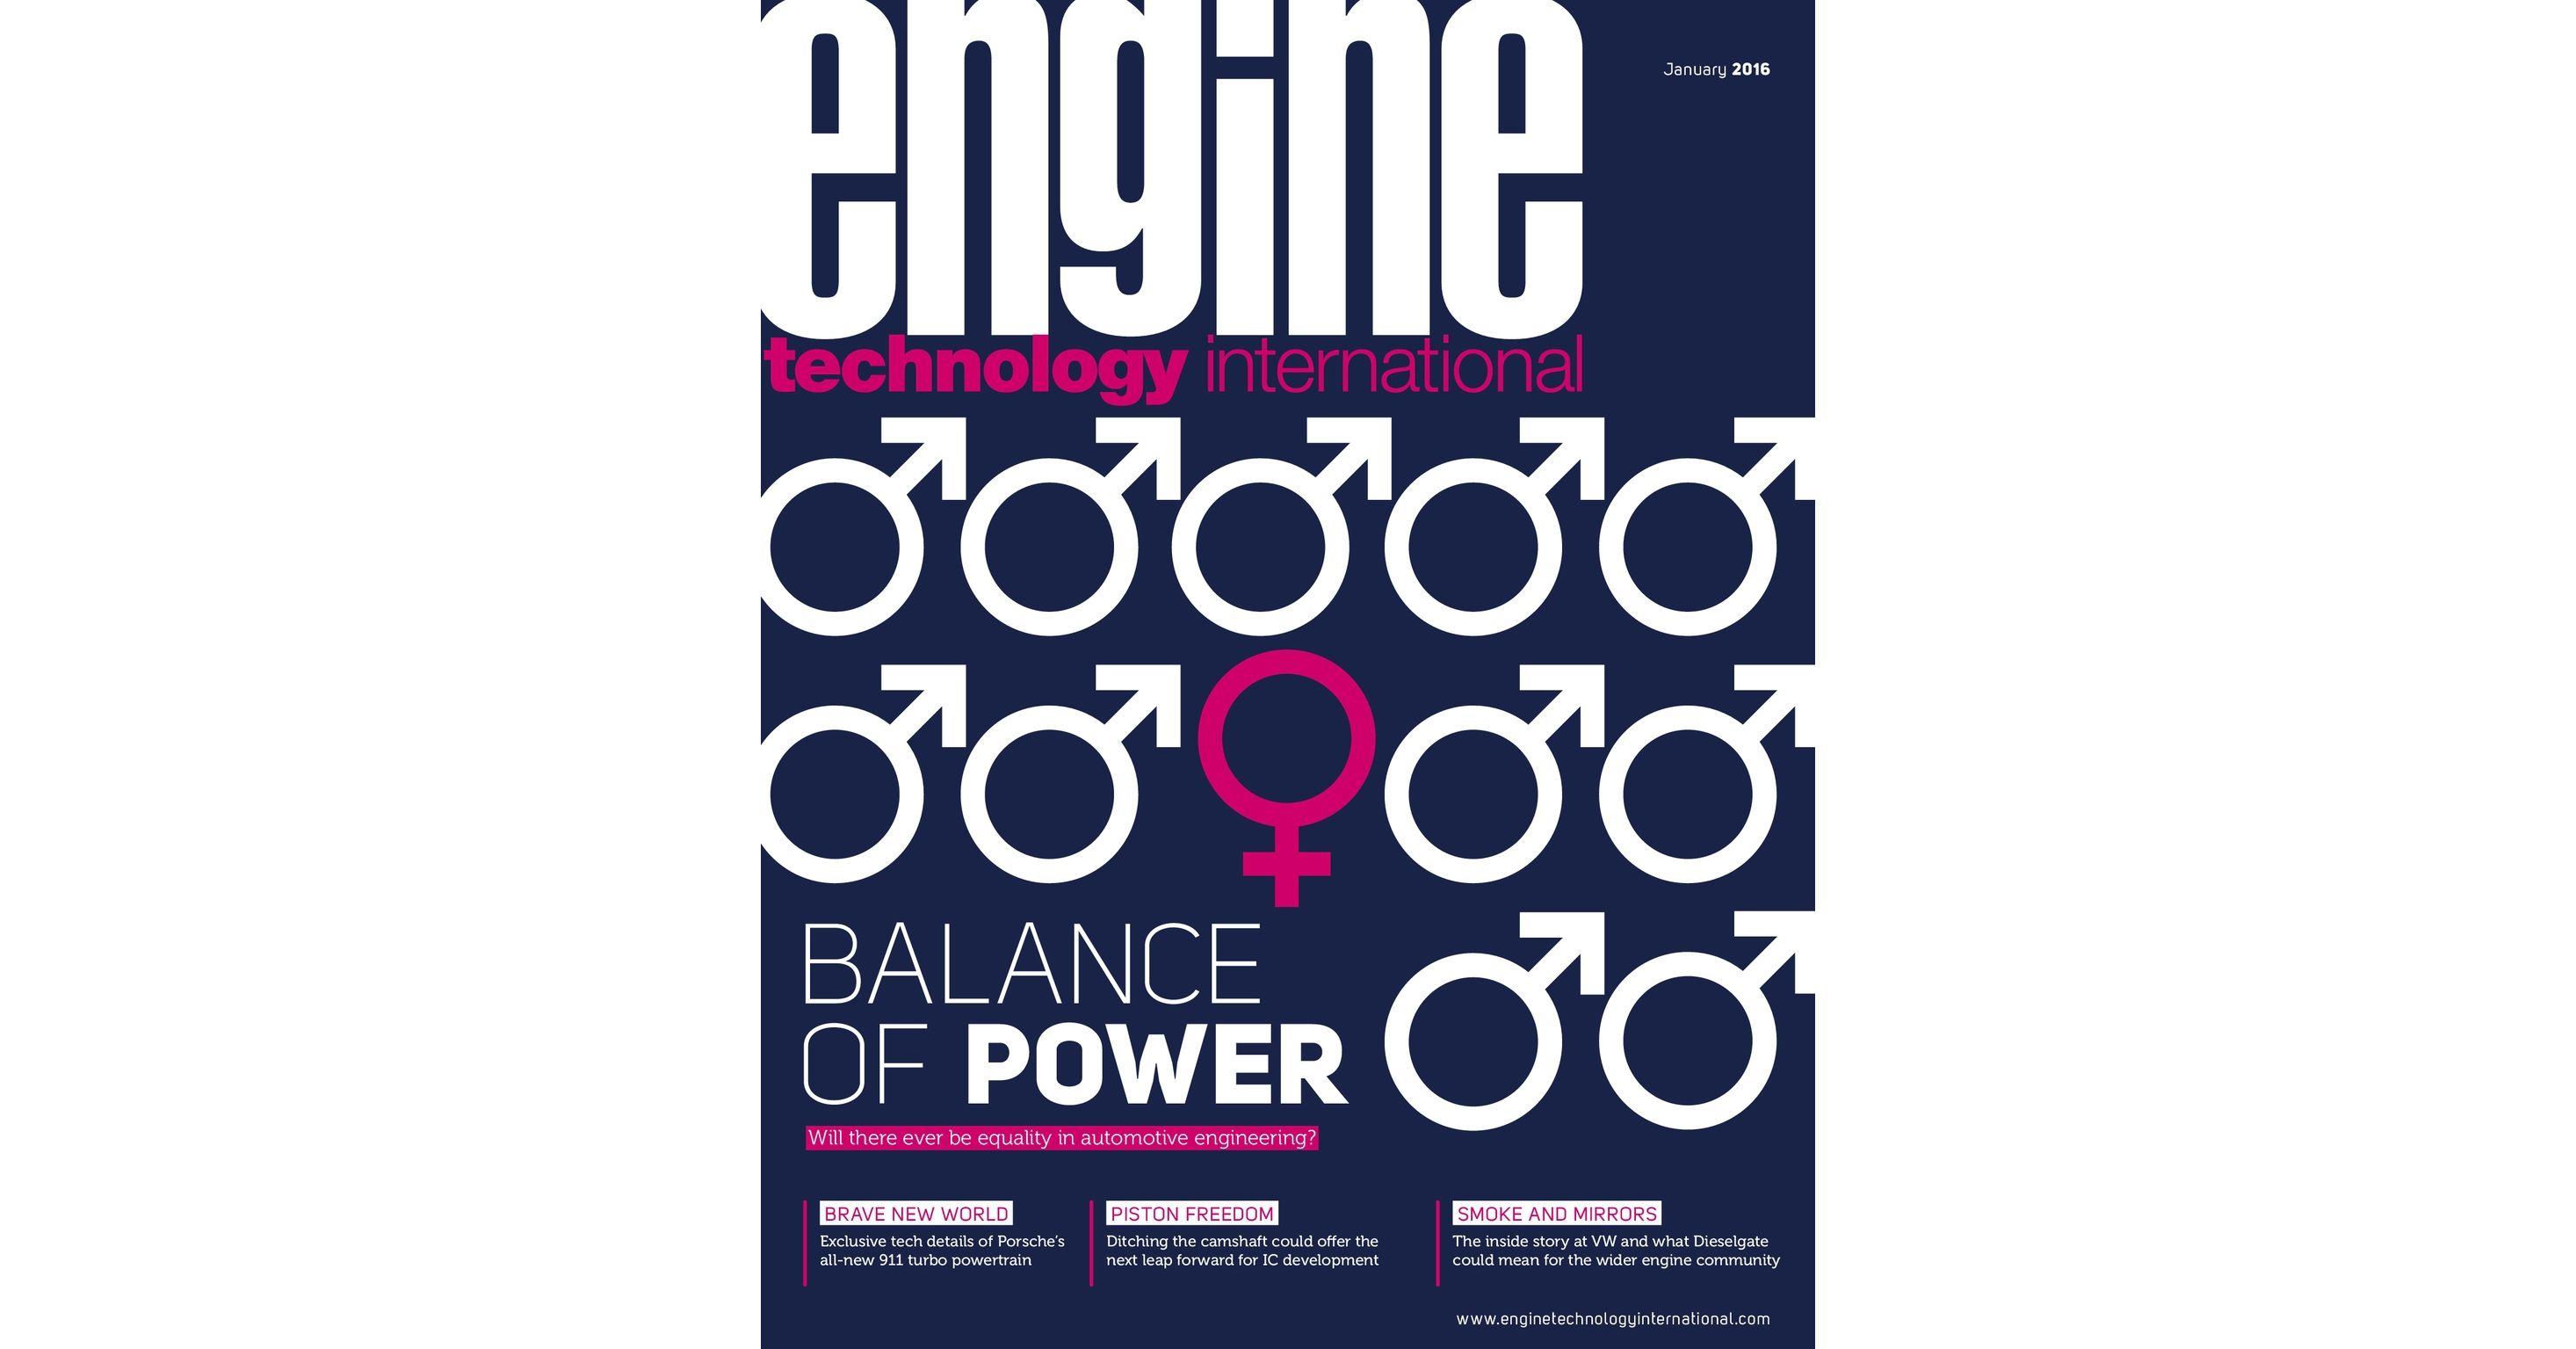 Engine Technology International - January 2016